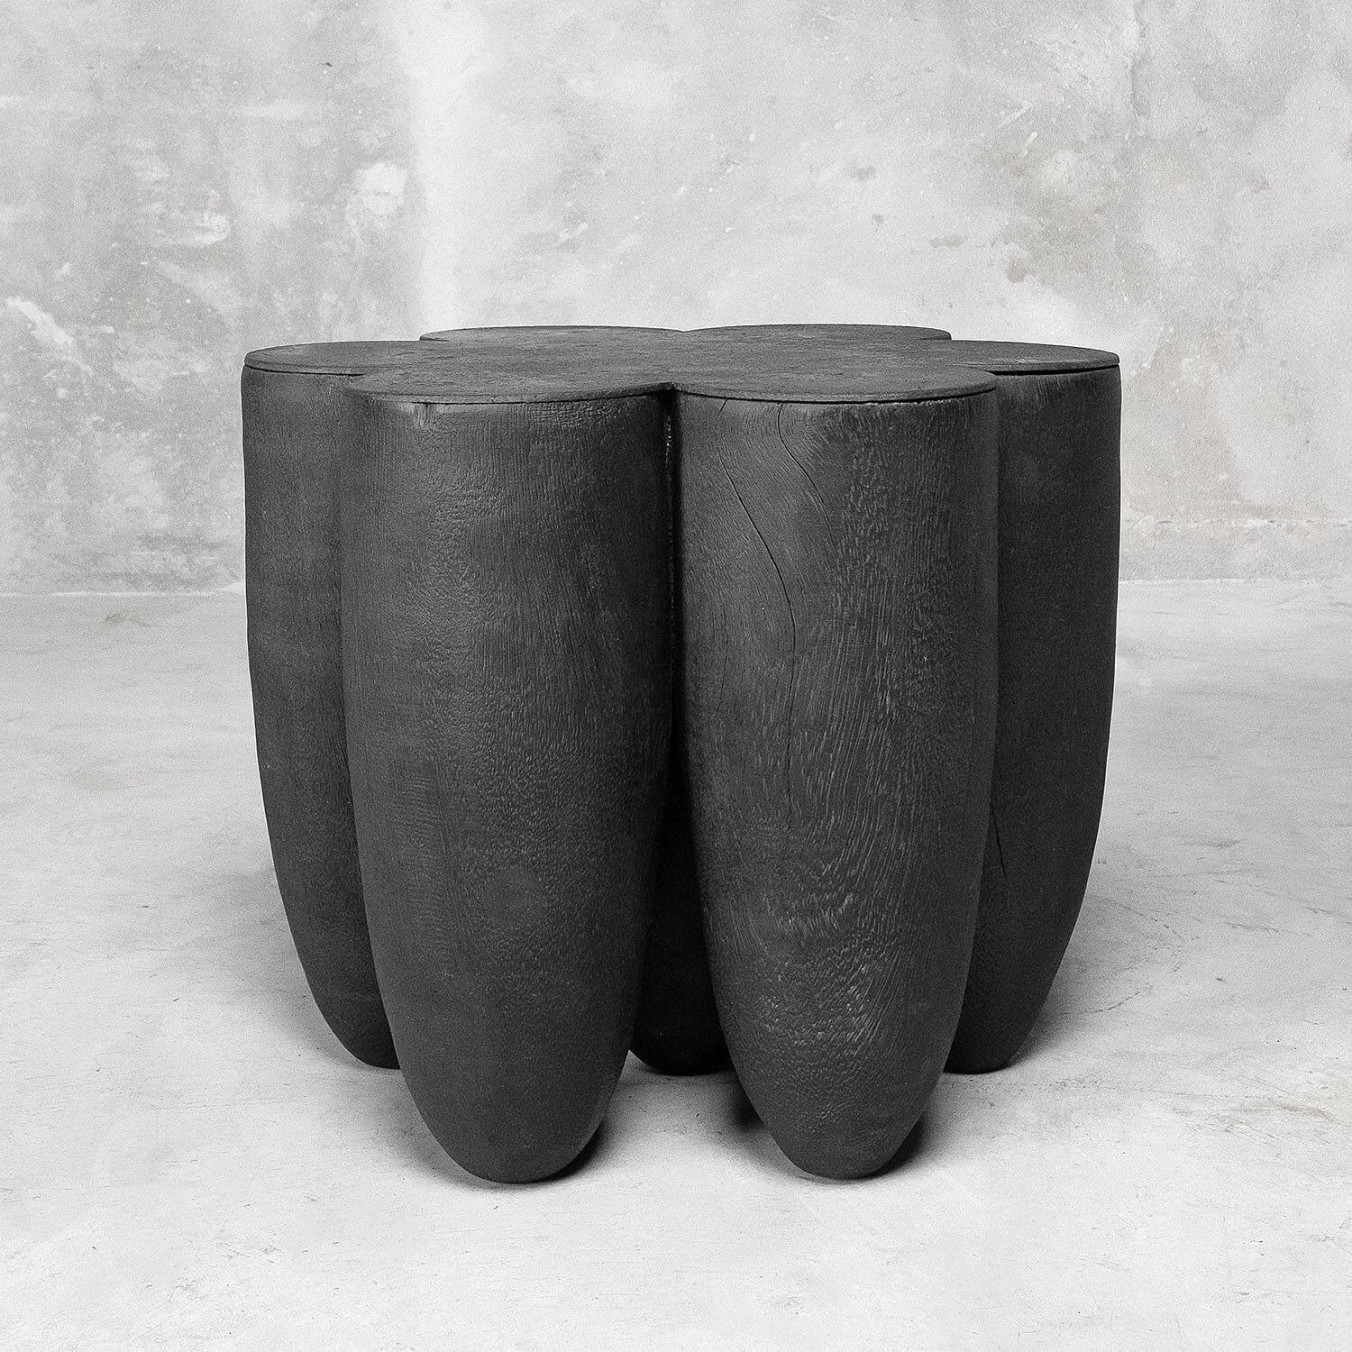 Senufo Coffee Table 2.0